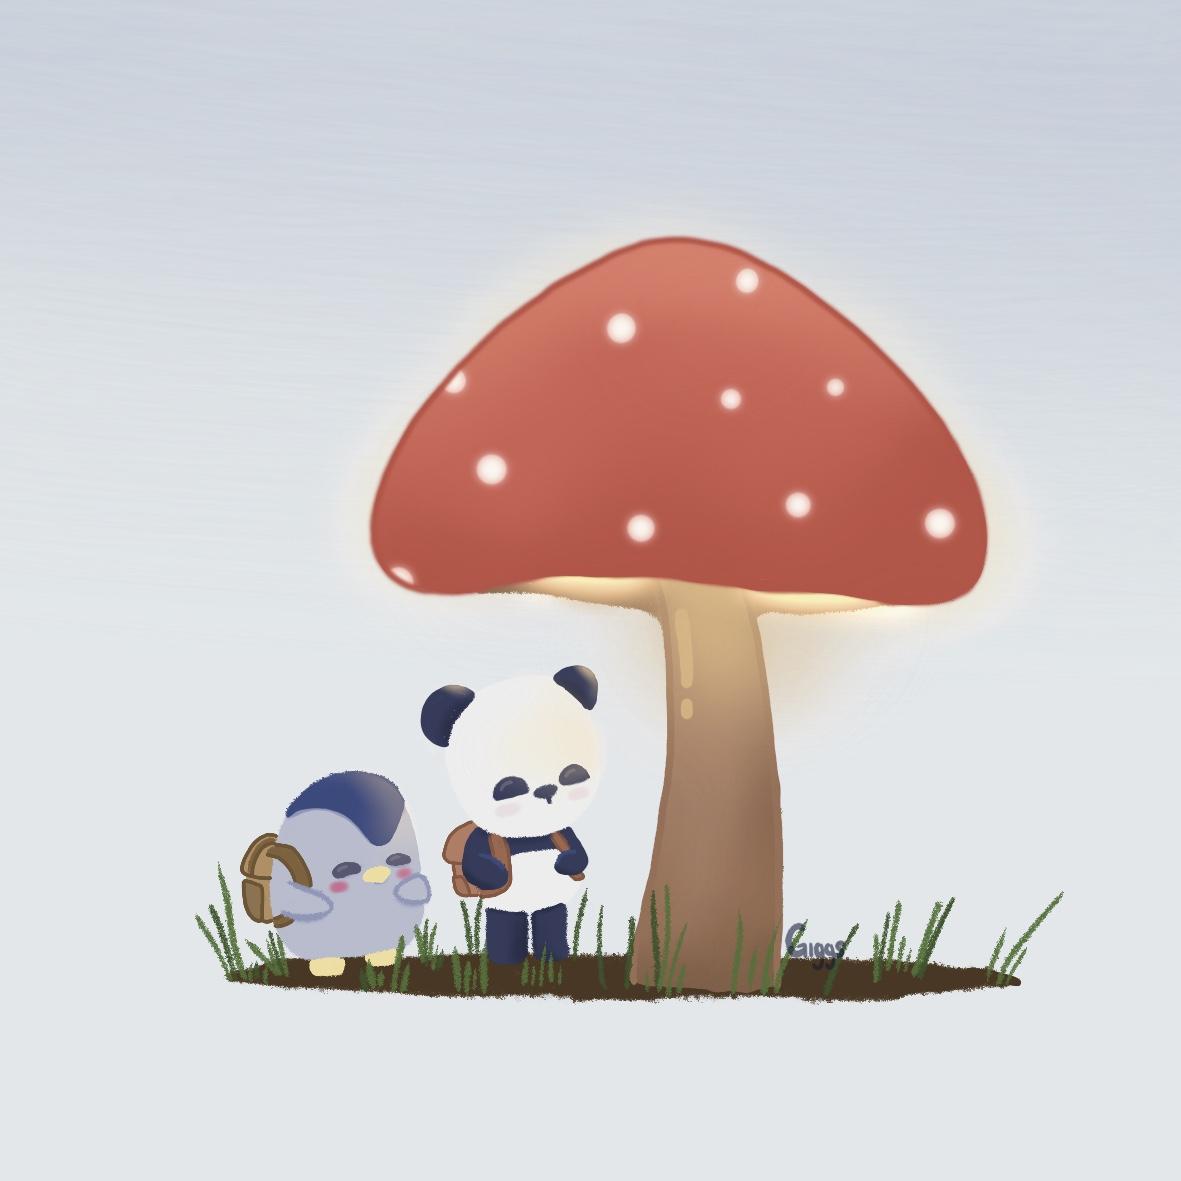 Day 93 of 100: Mushroom